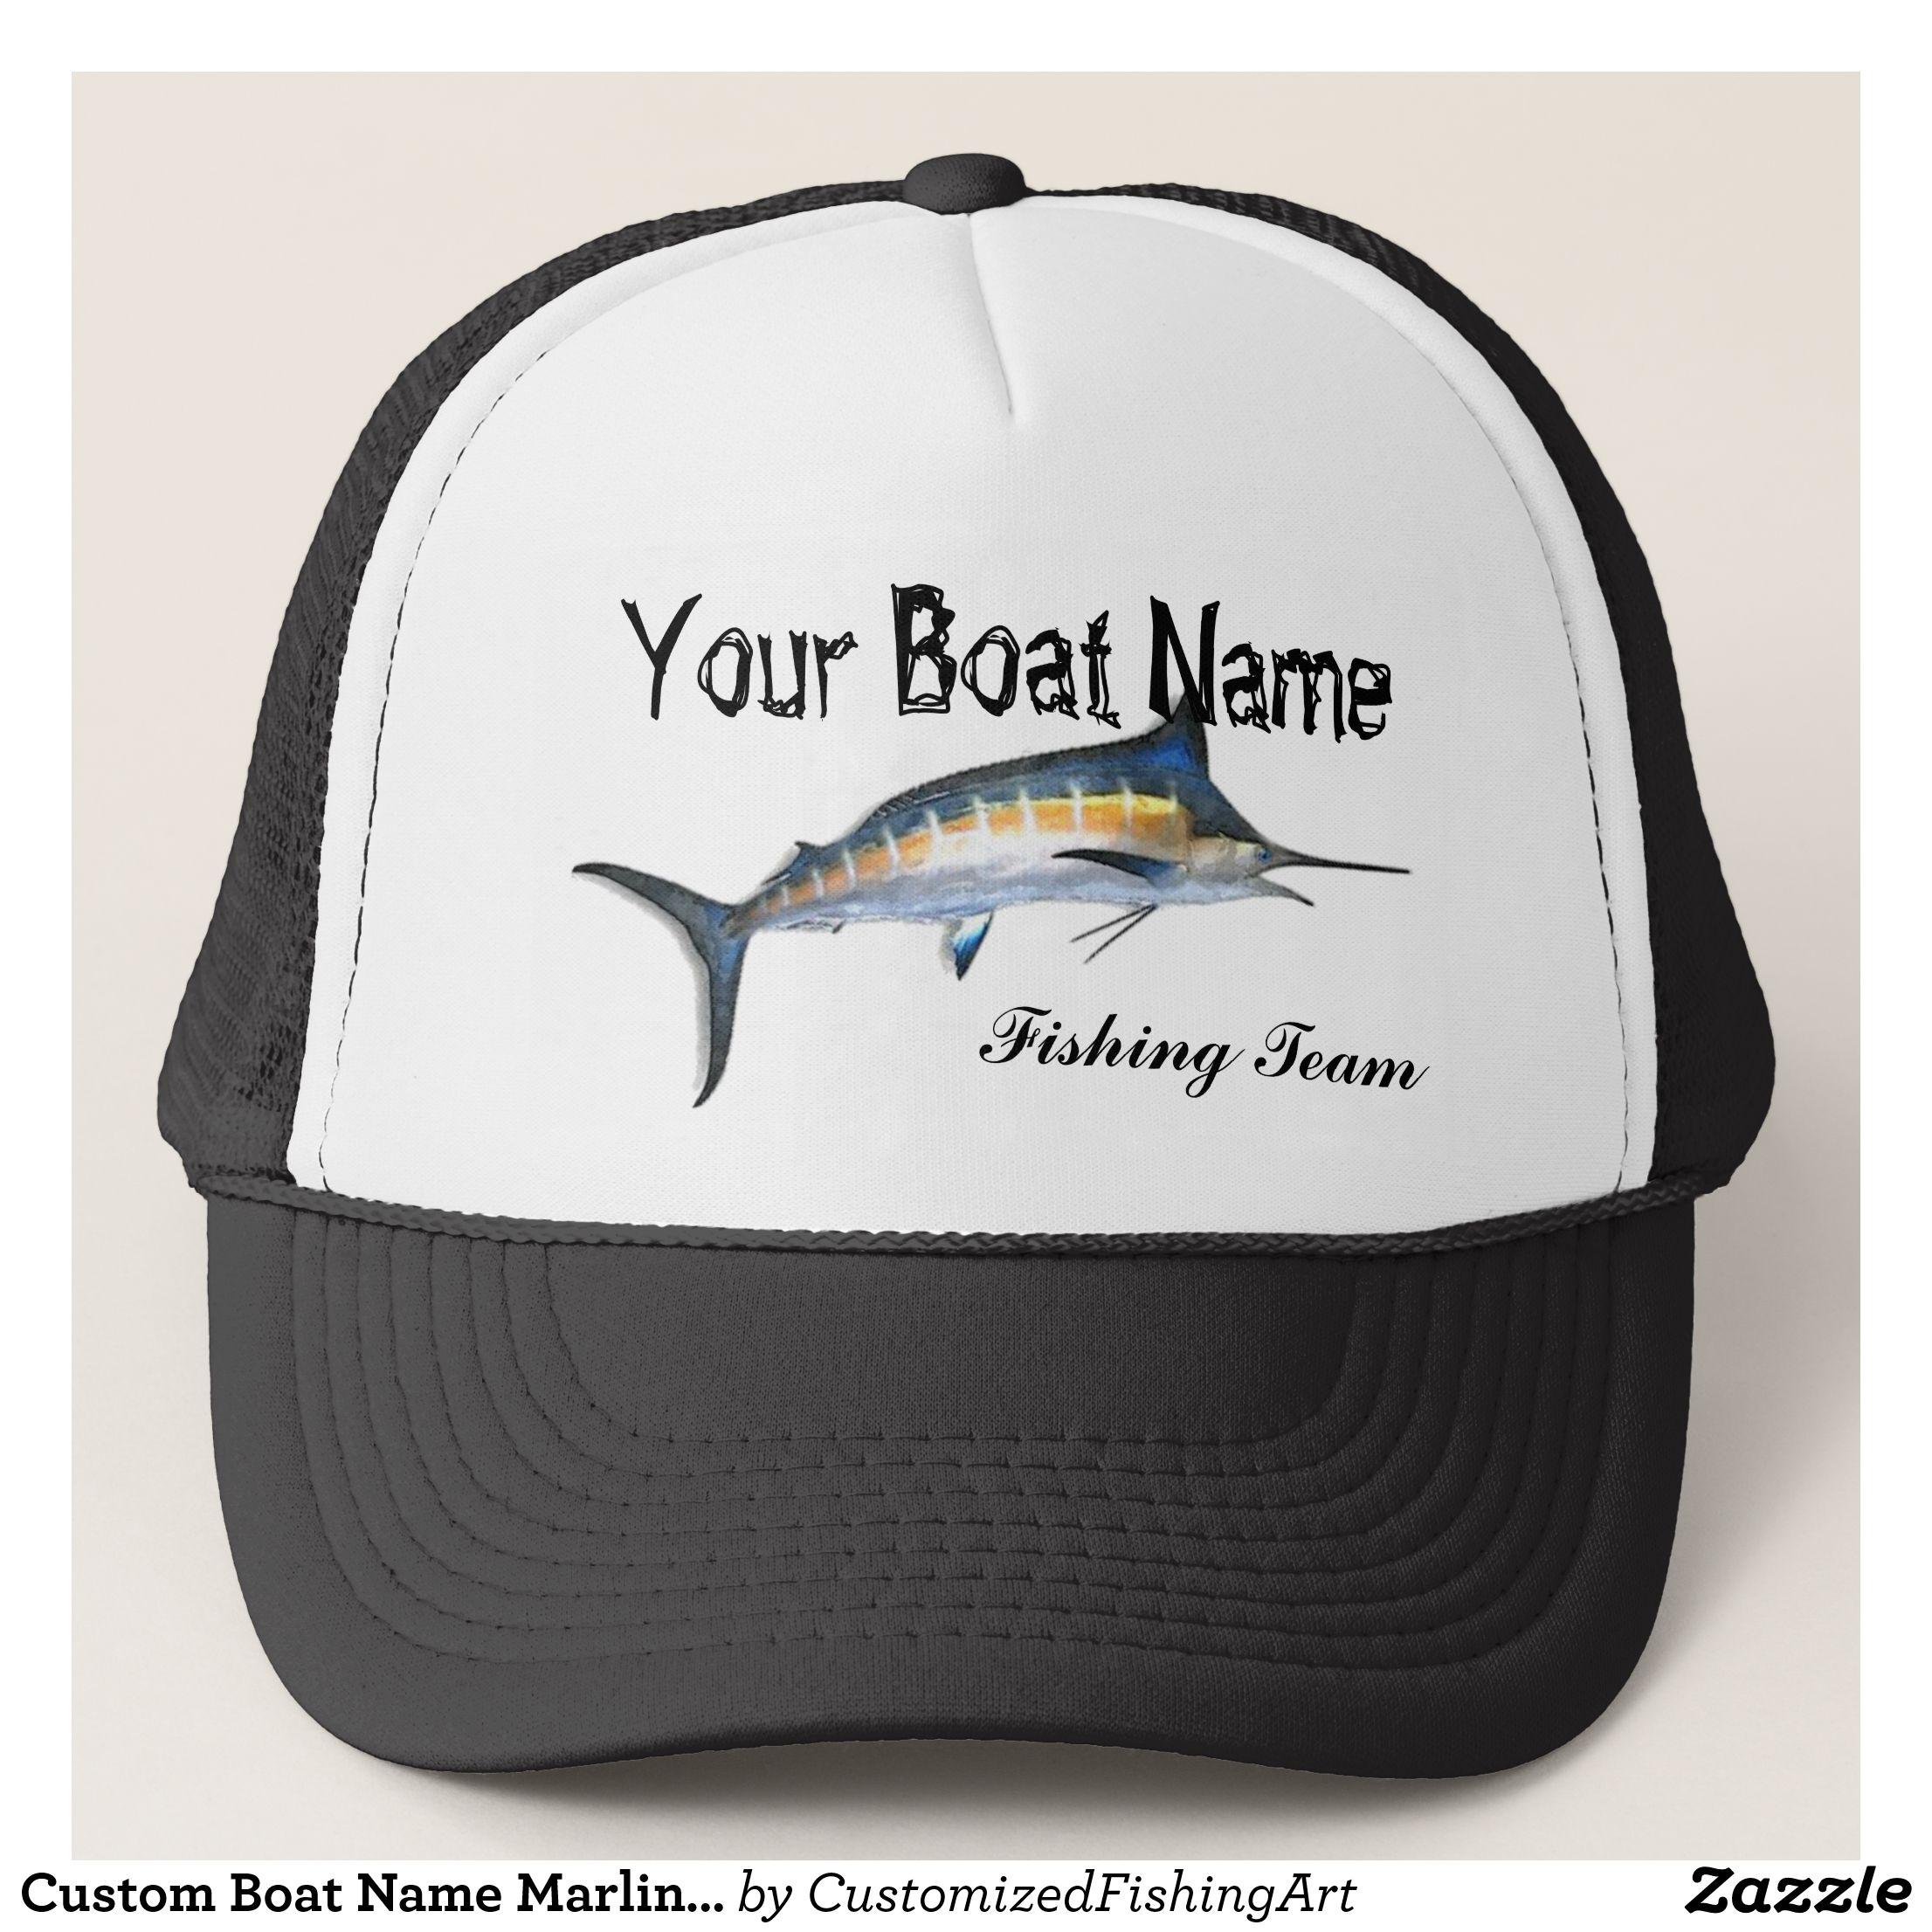 e4b4b4e592c86 Custom Boat Name Marlin trucker hat - Fashionable Urban And Outdoor Hunter  Farmer Trucker Hats By